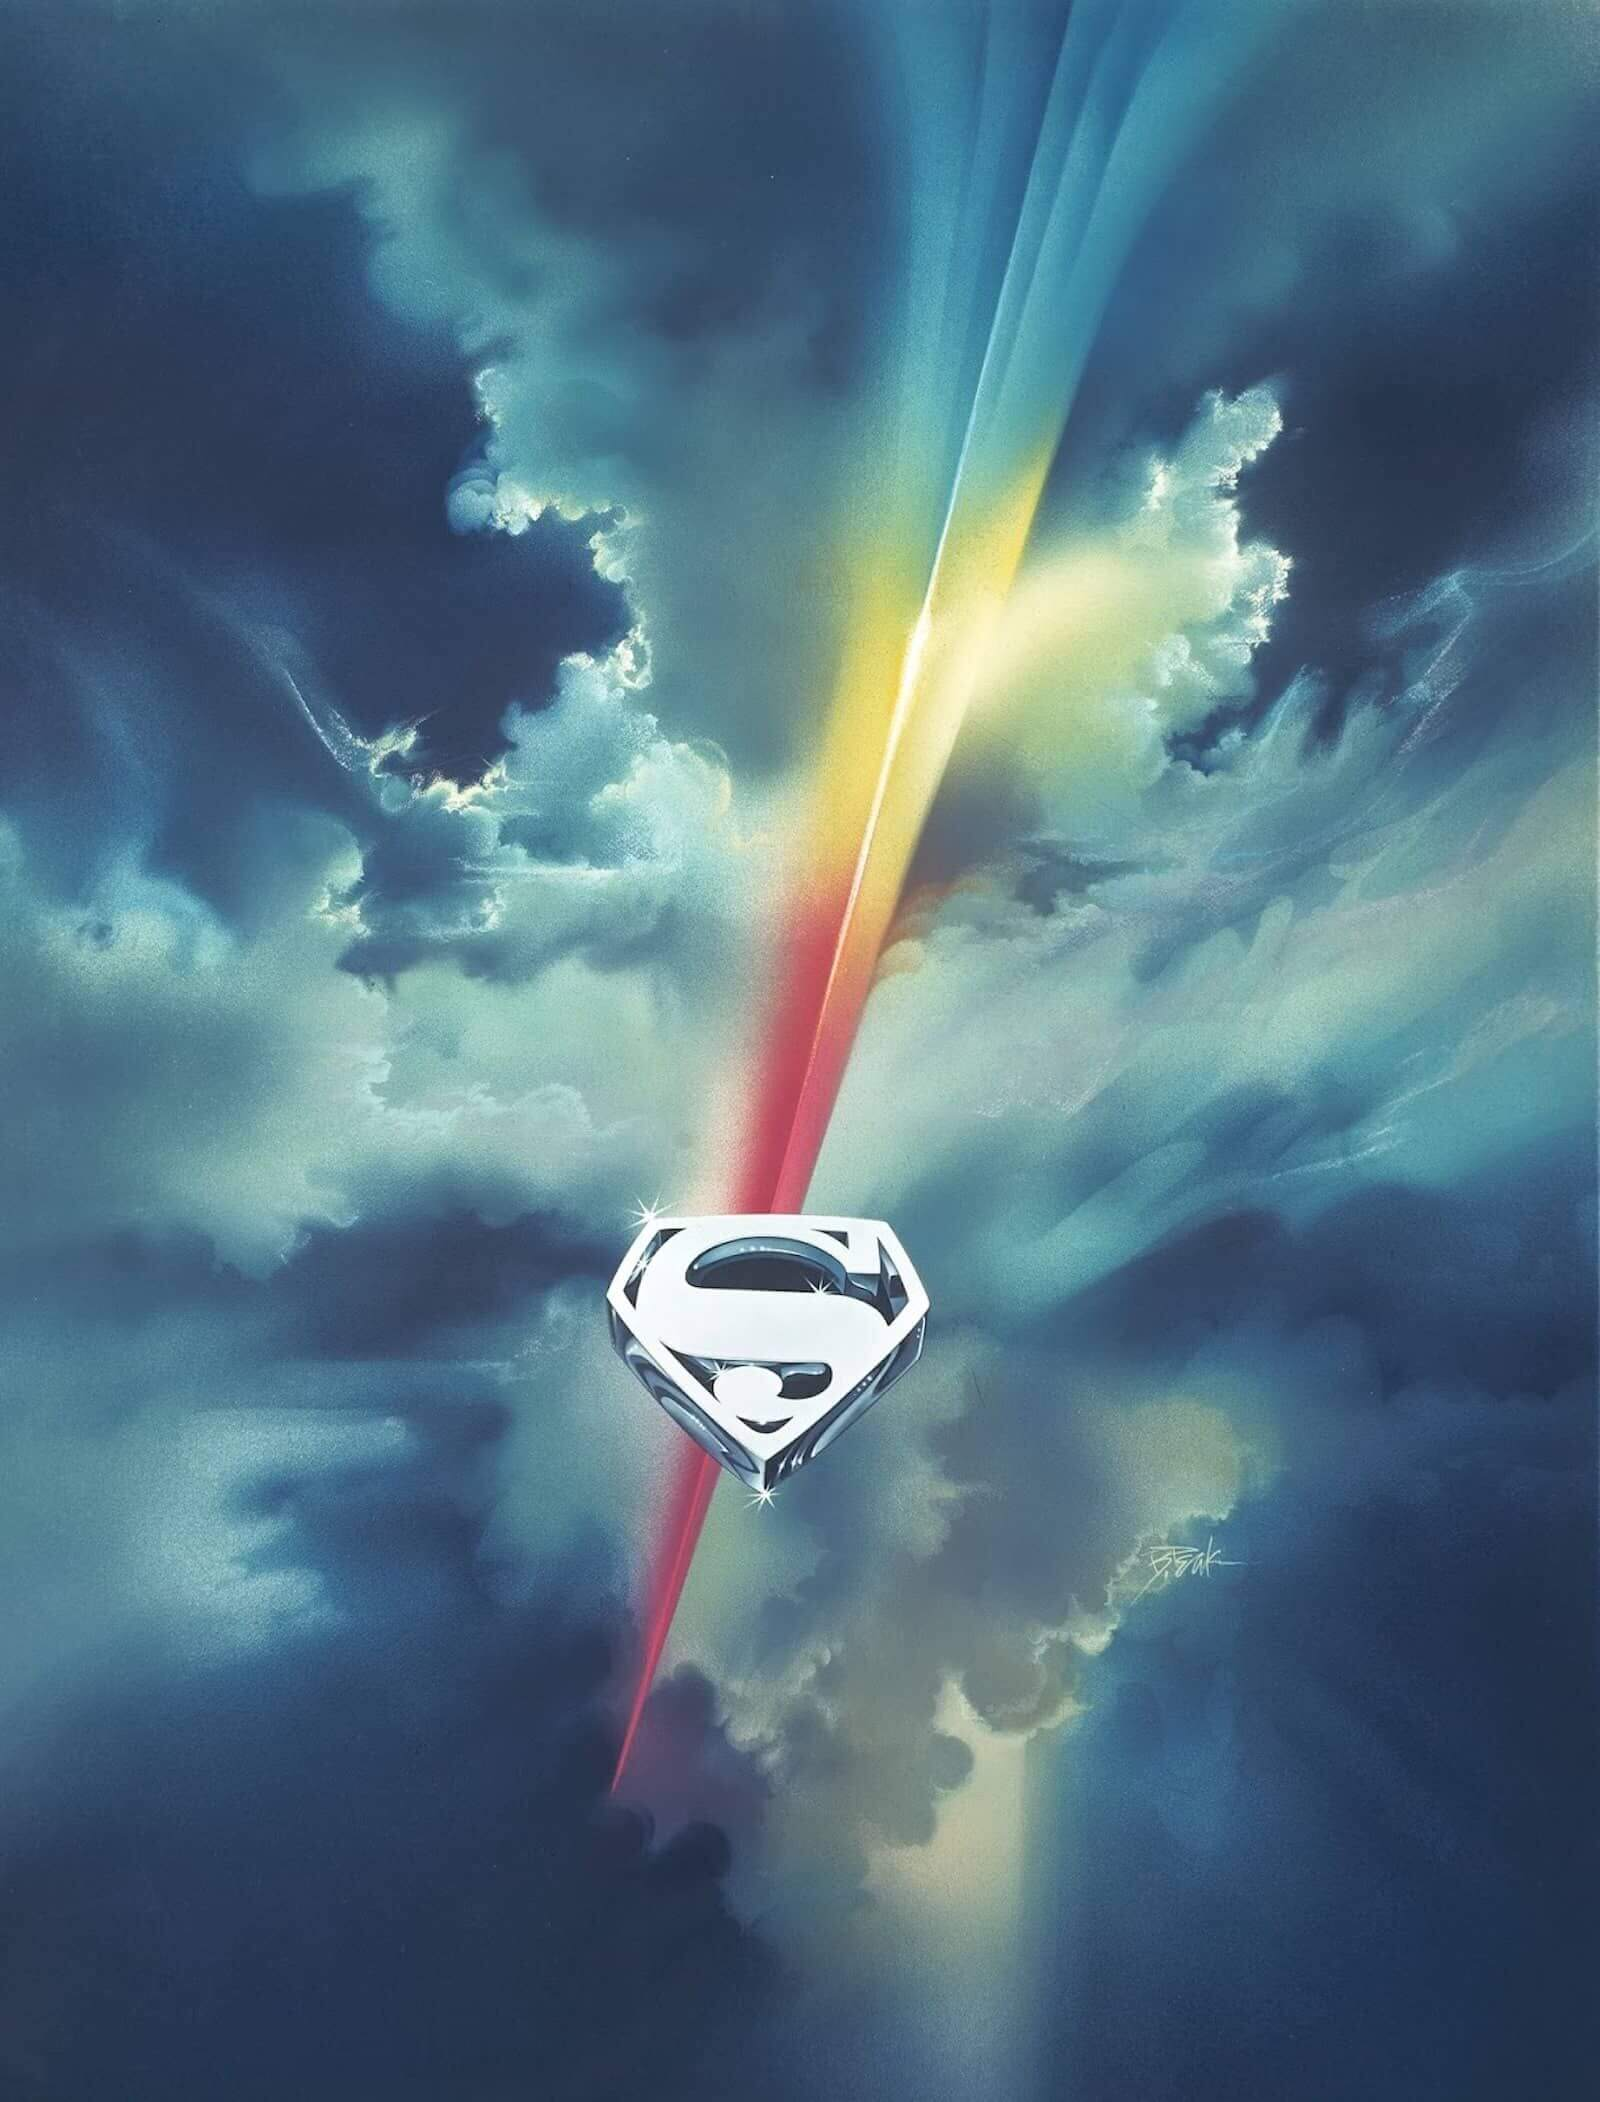 best movie taglines superman